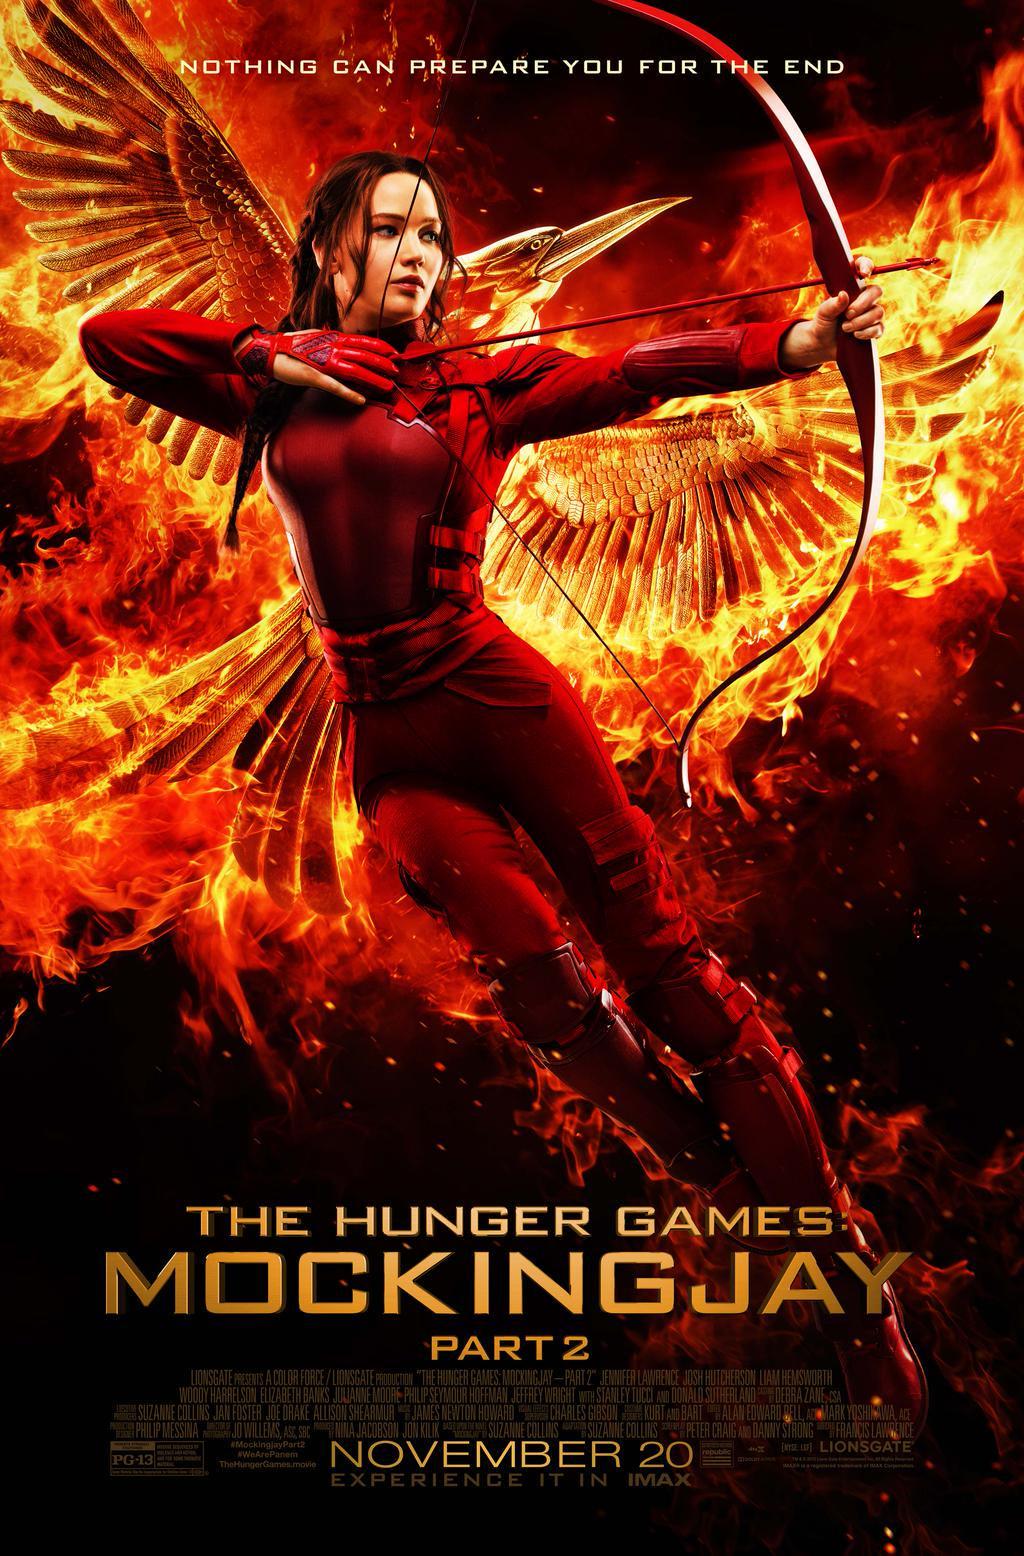 The Hunger Games: Mockingjay – Part 2 (2015) เกมล่าเกม ม็อกกิ้งเจย์ พาร์ท 2